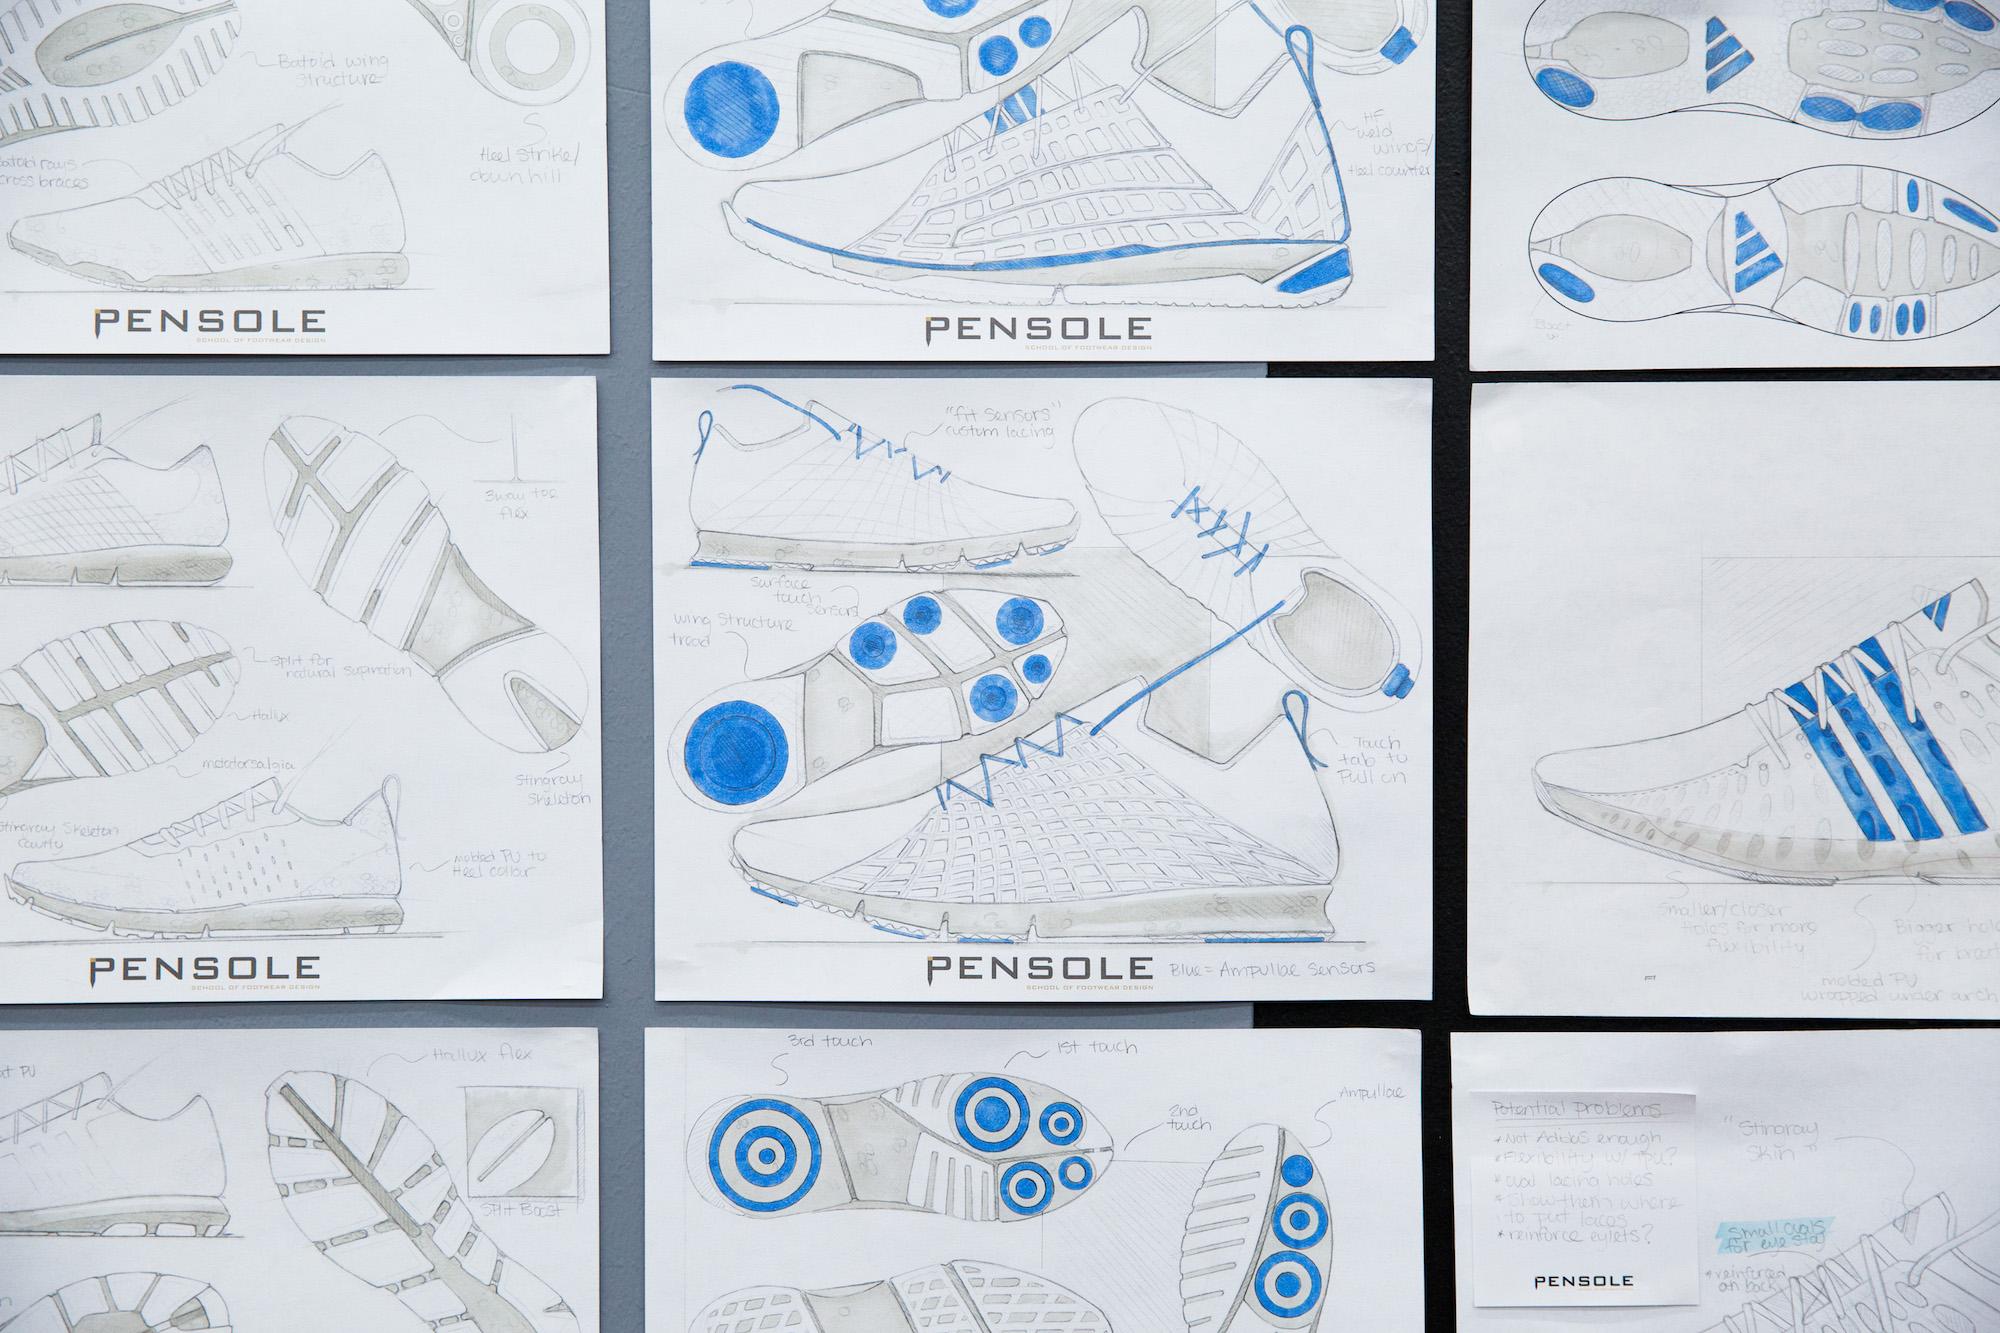 pensole Kolding School of Design 6